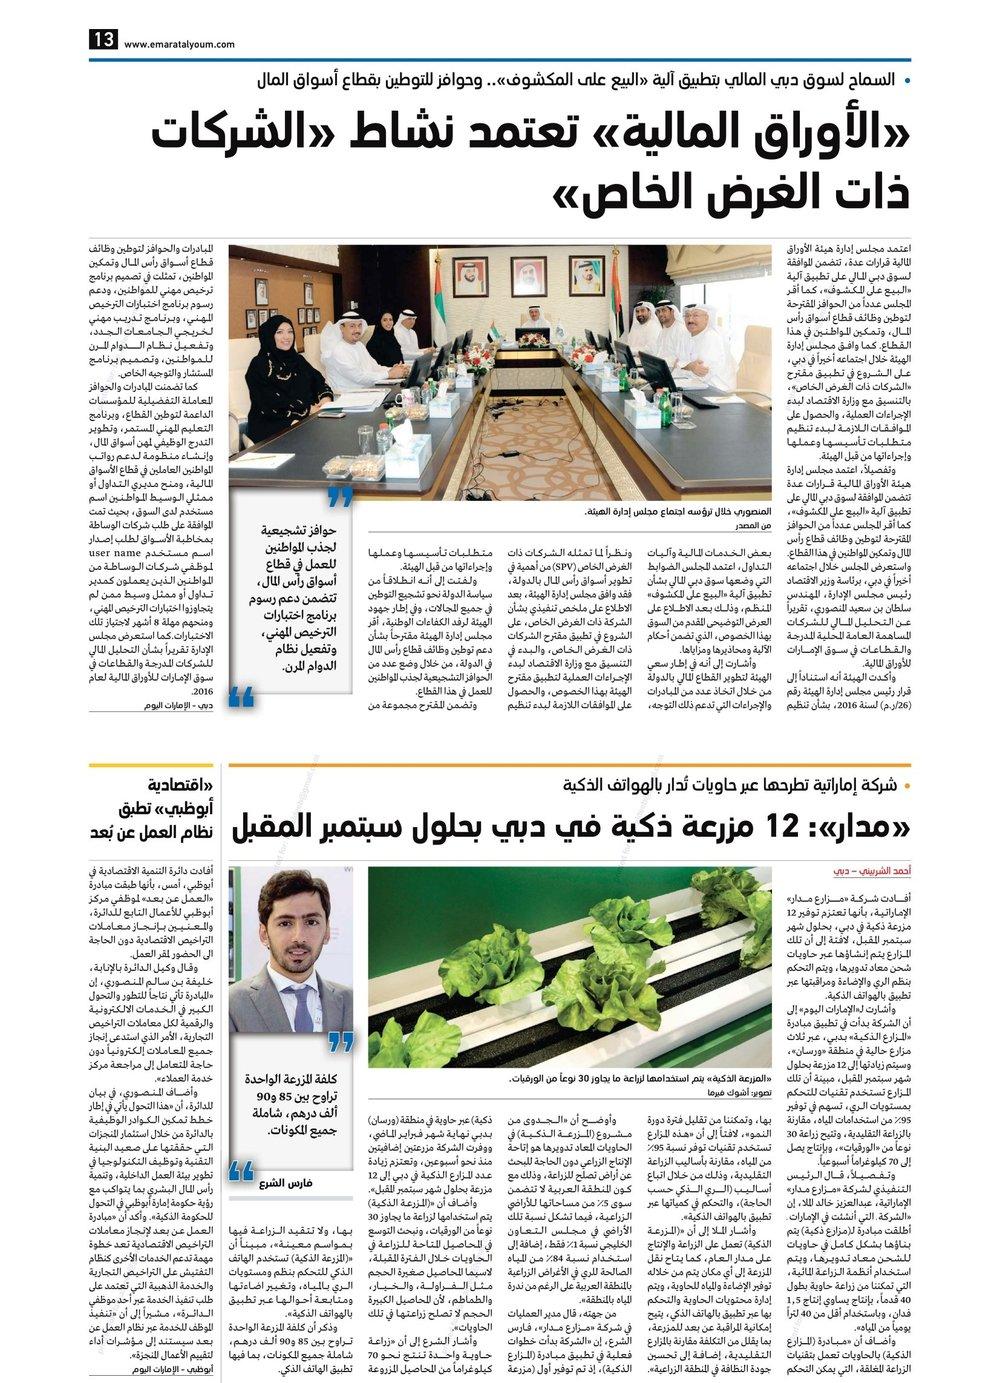 EmiratesToday Page 13- 24 April 2017.jpg